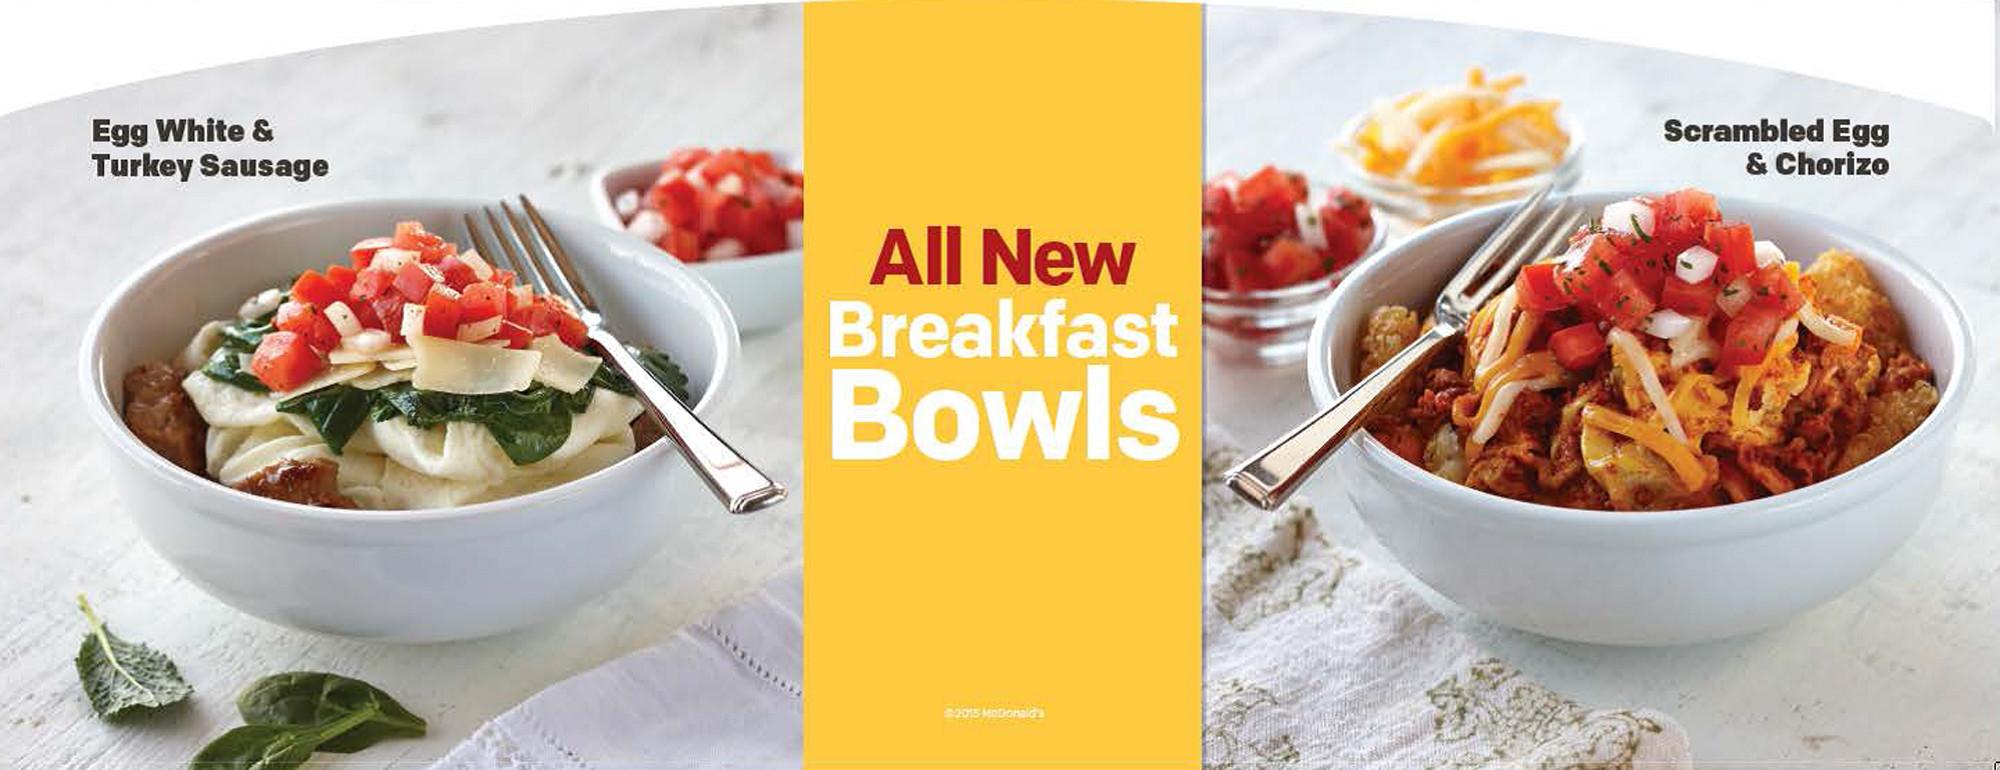 Healthy Breakfast Mcdonalds  McDonald s adding new ingre nt kale HT Health